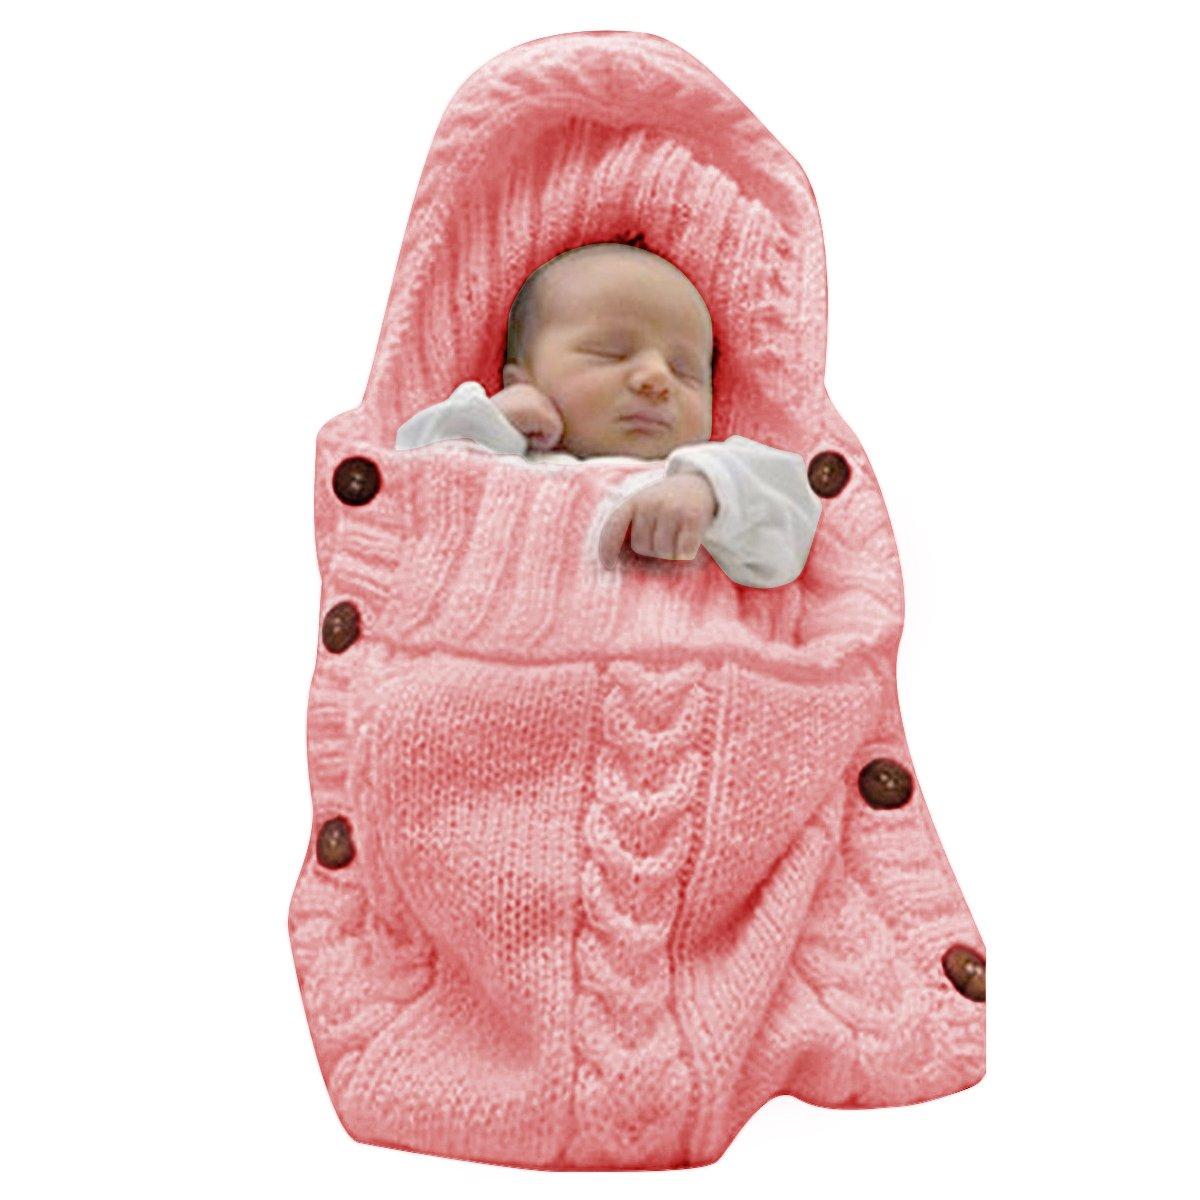 Mother & Kids Soft Baby Plush Toys Baby Sleeping Warp Swaddling Security Blanket Baby Plush Toy Kids Birthday Christmas Gift Baby Blanket